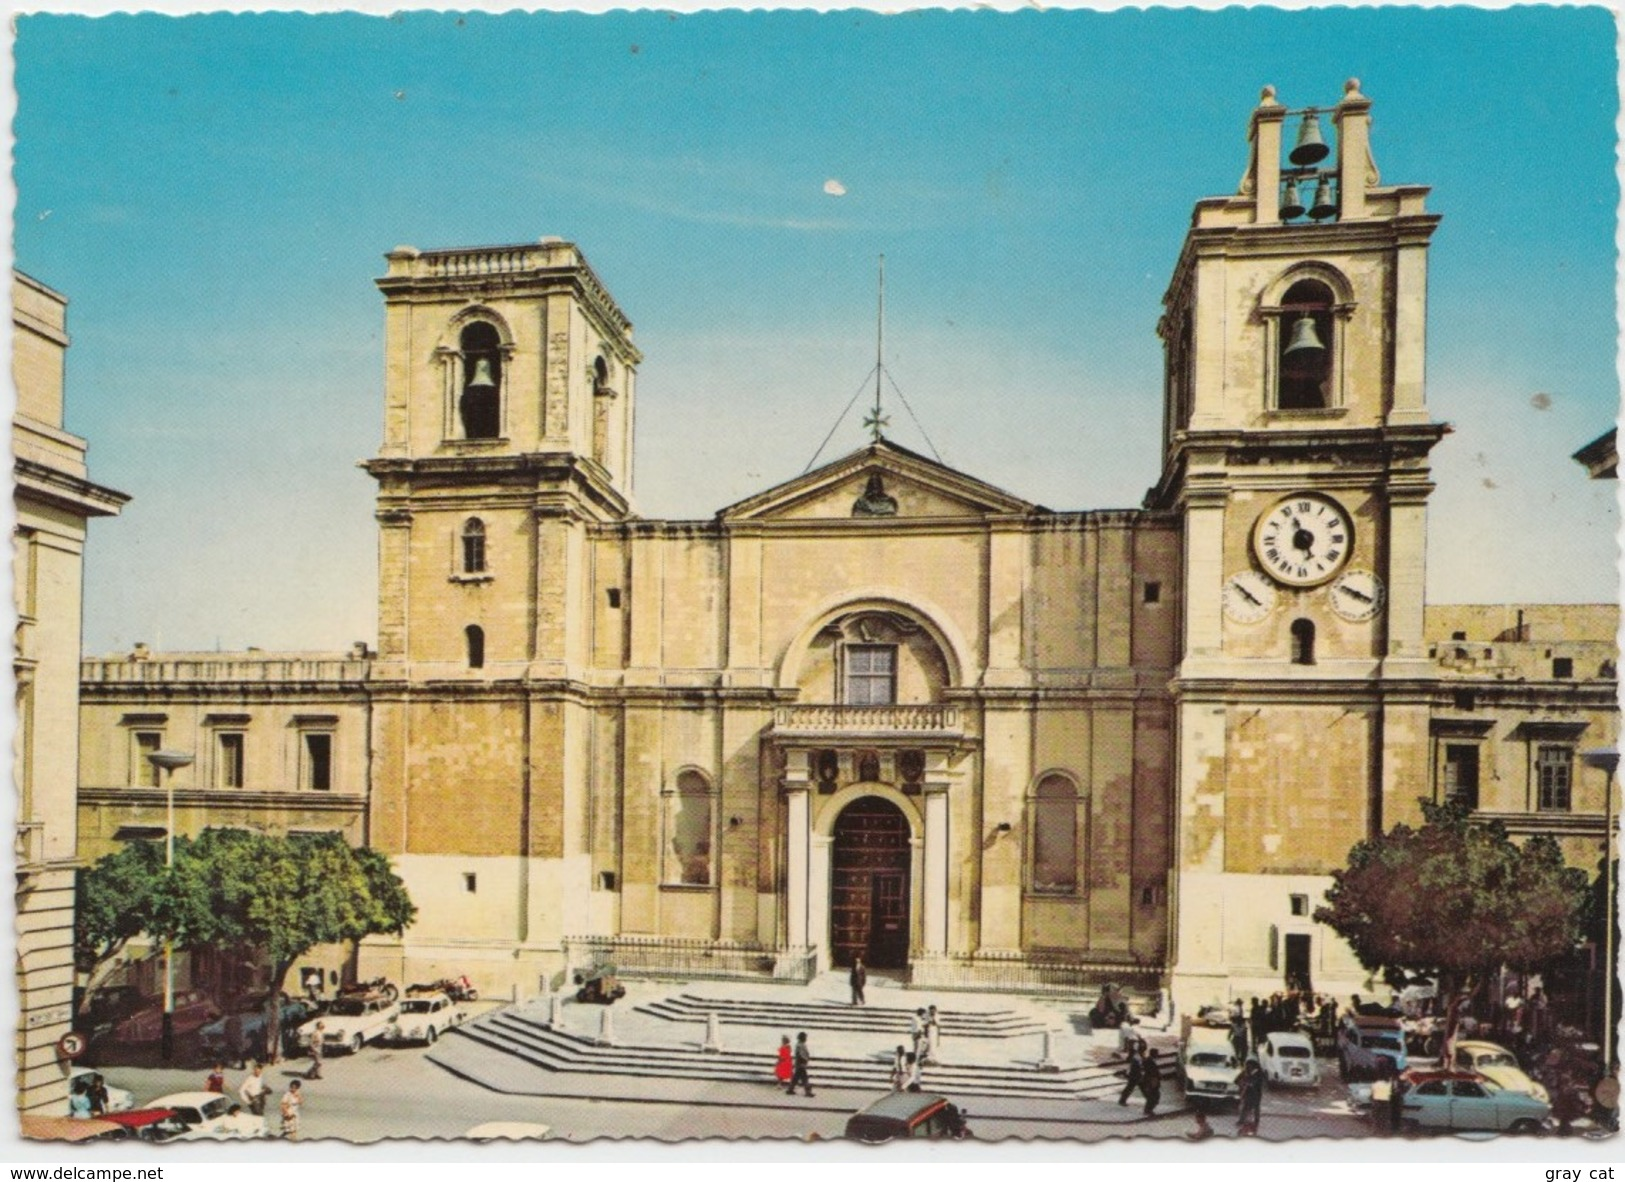 MALTA, St. John's Co-Cathedral, 1960s Unused Postcard [20678] - Malta